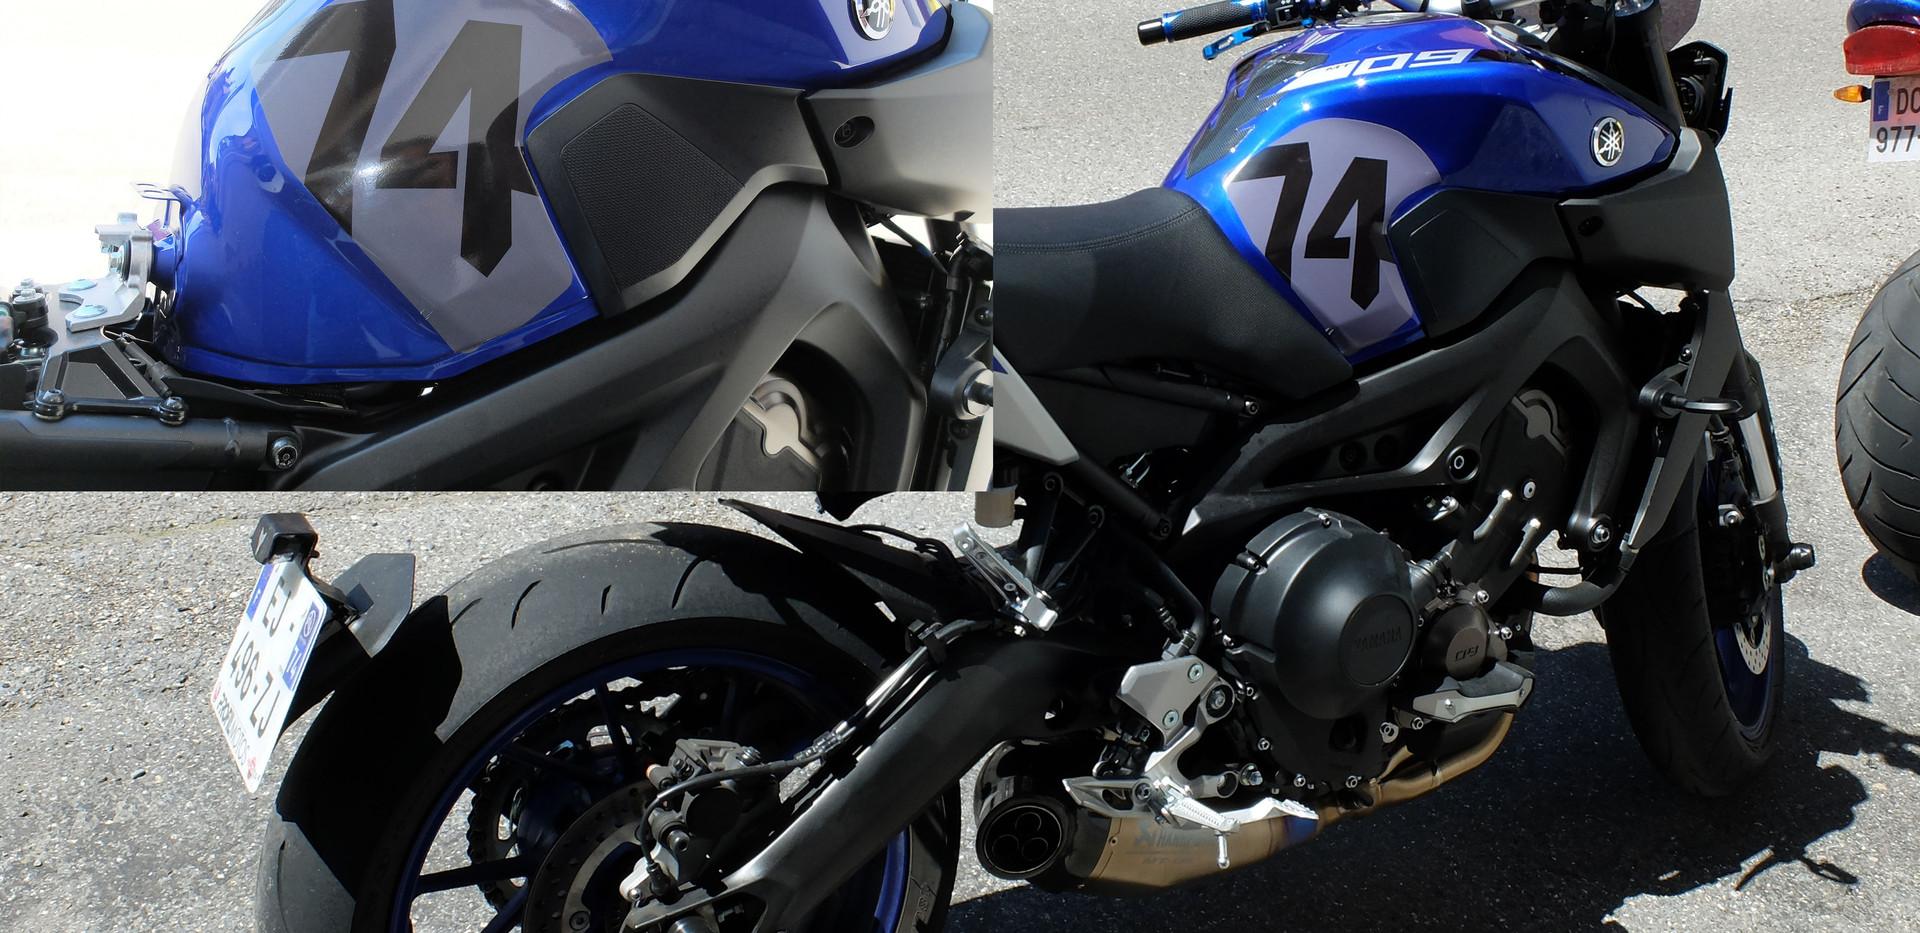 Protection moto.jpg